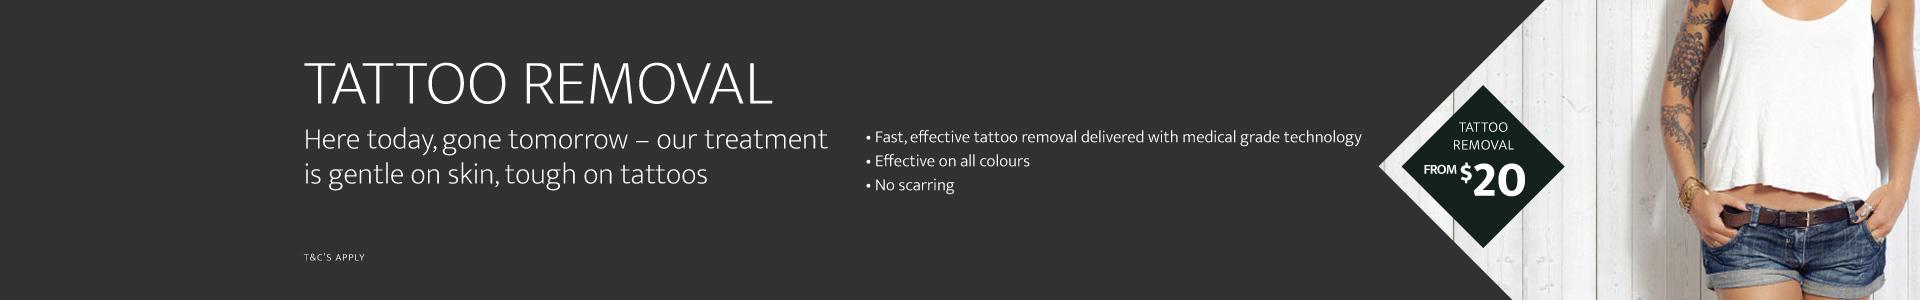 Affordable Laser Tattoo Removal in Sydney | Evolution Laser Clinic